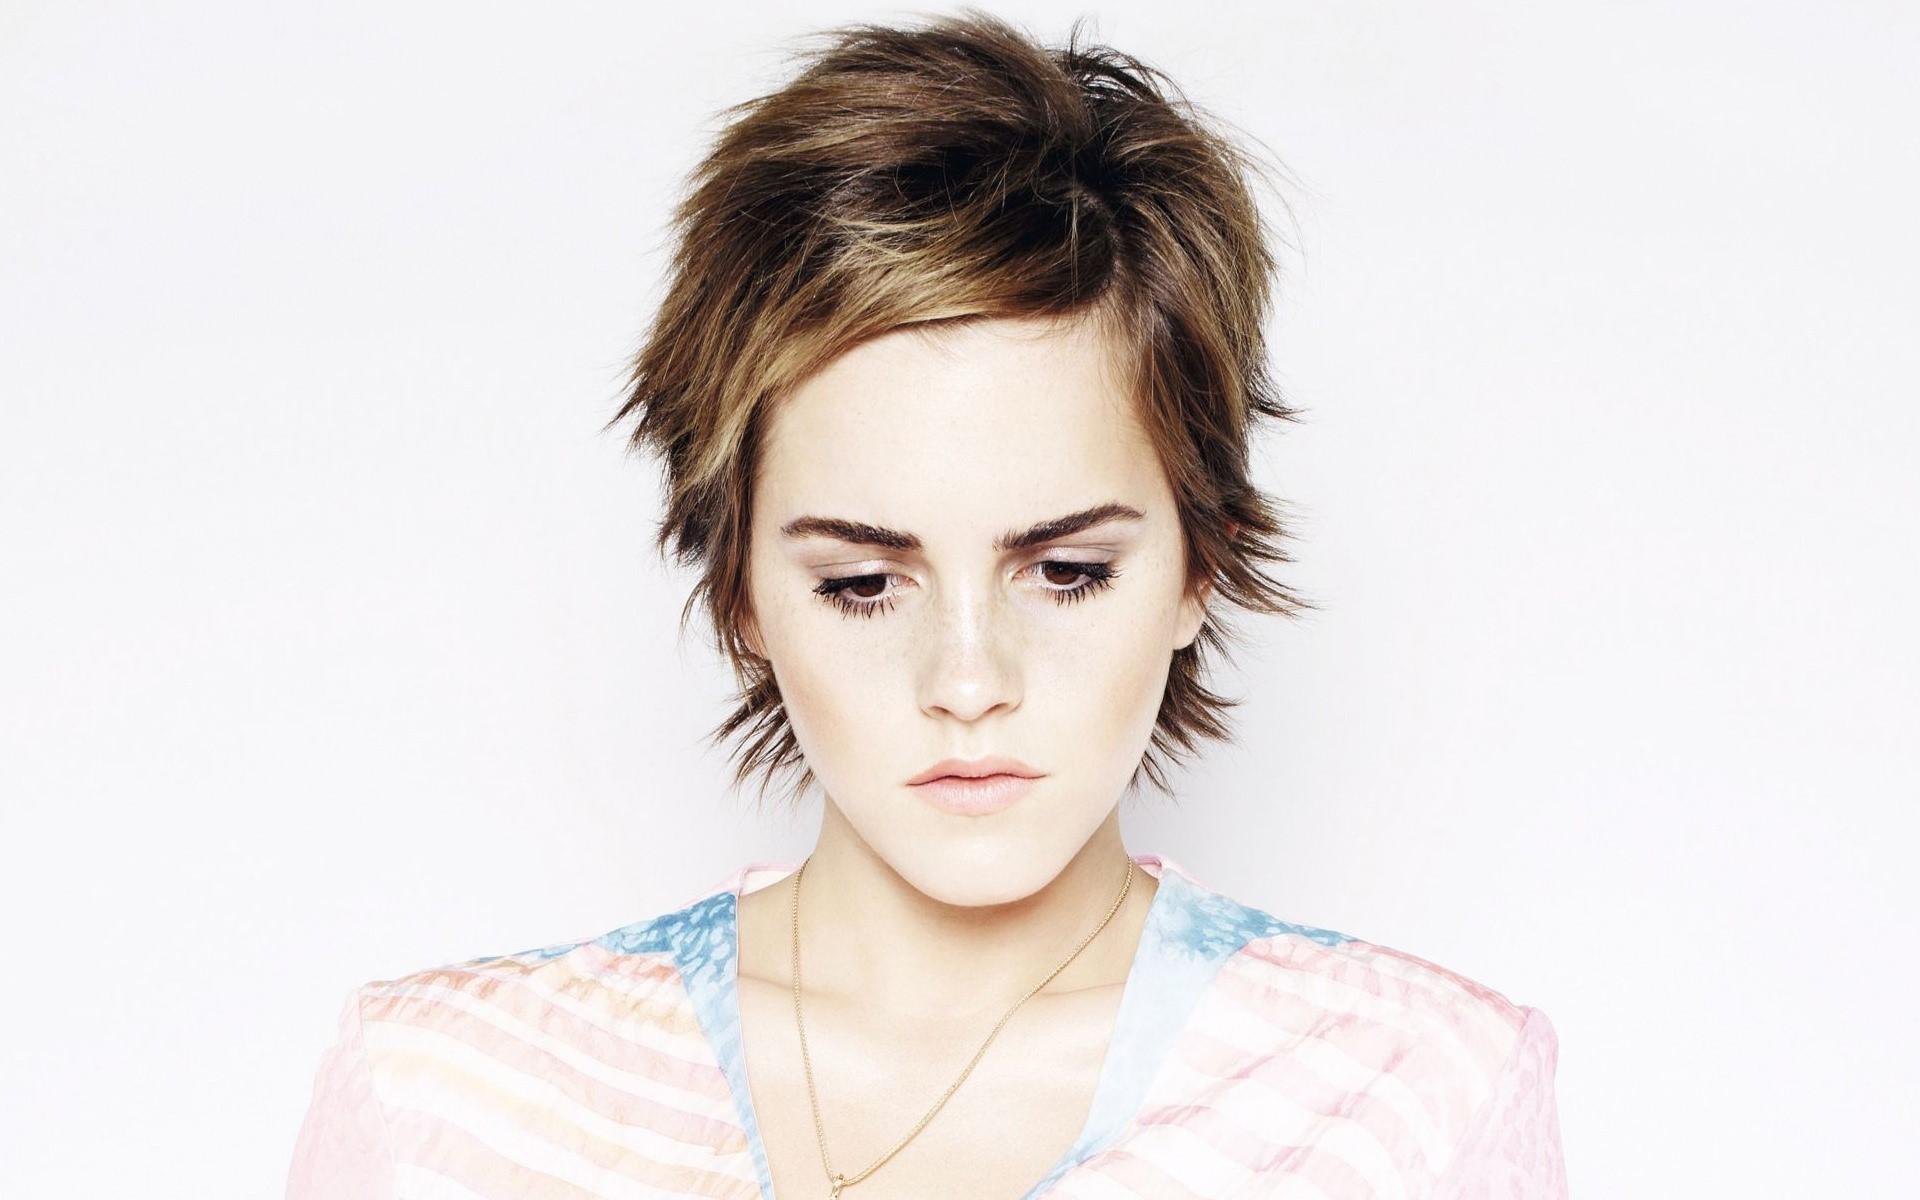 Wallpaper Emma Watson mirando abajo Images